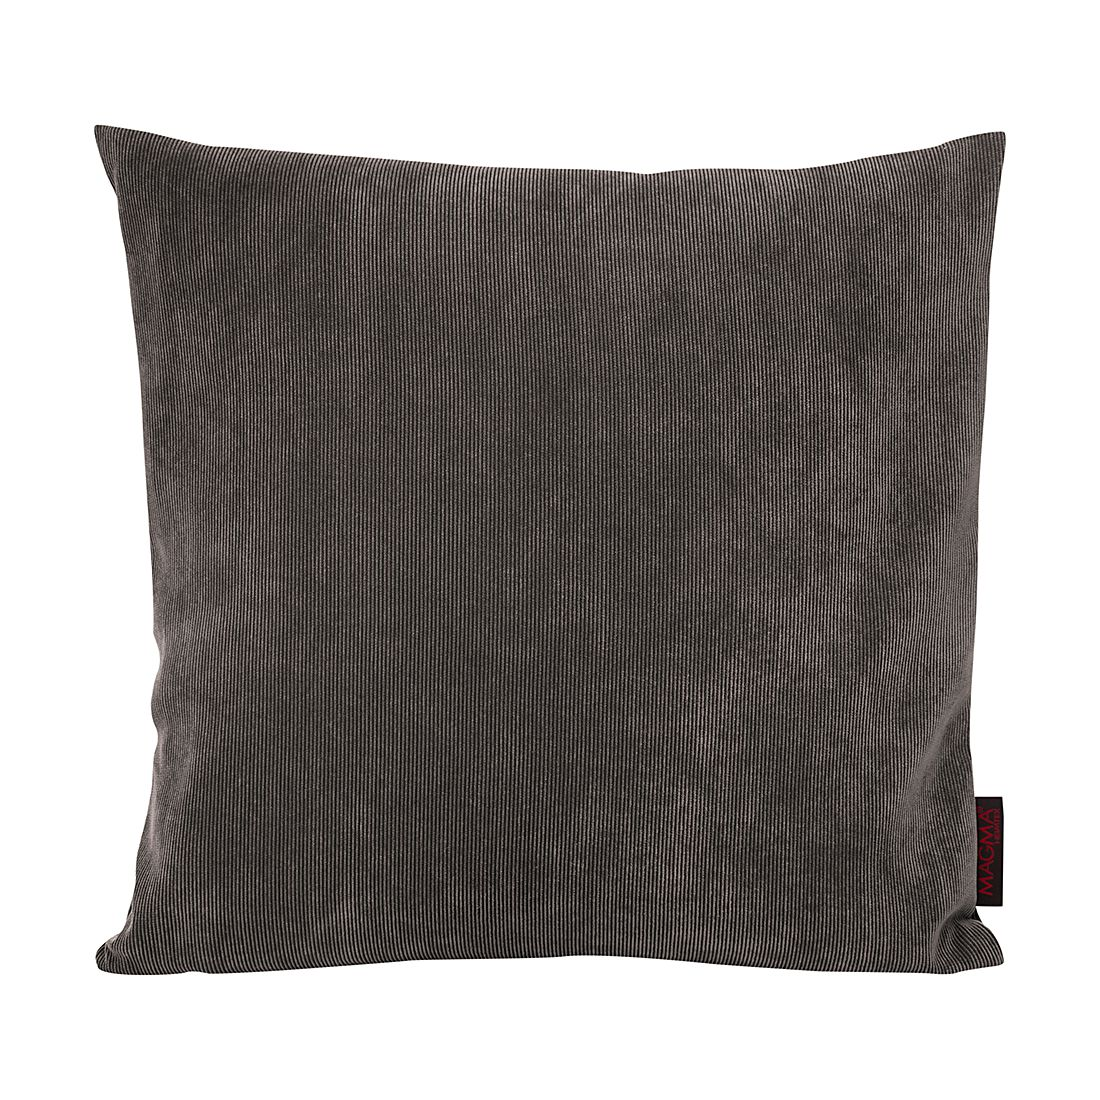 Kissenhülle Barrie – Anthrazit – 40 x 40 cm, Magma-Heimtex online bestellen